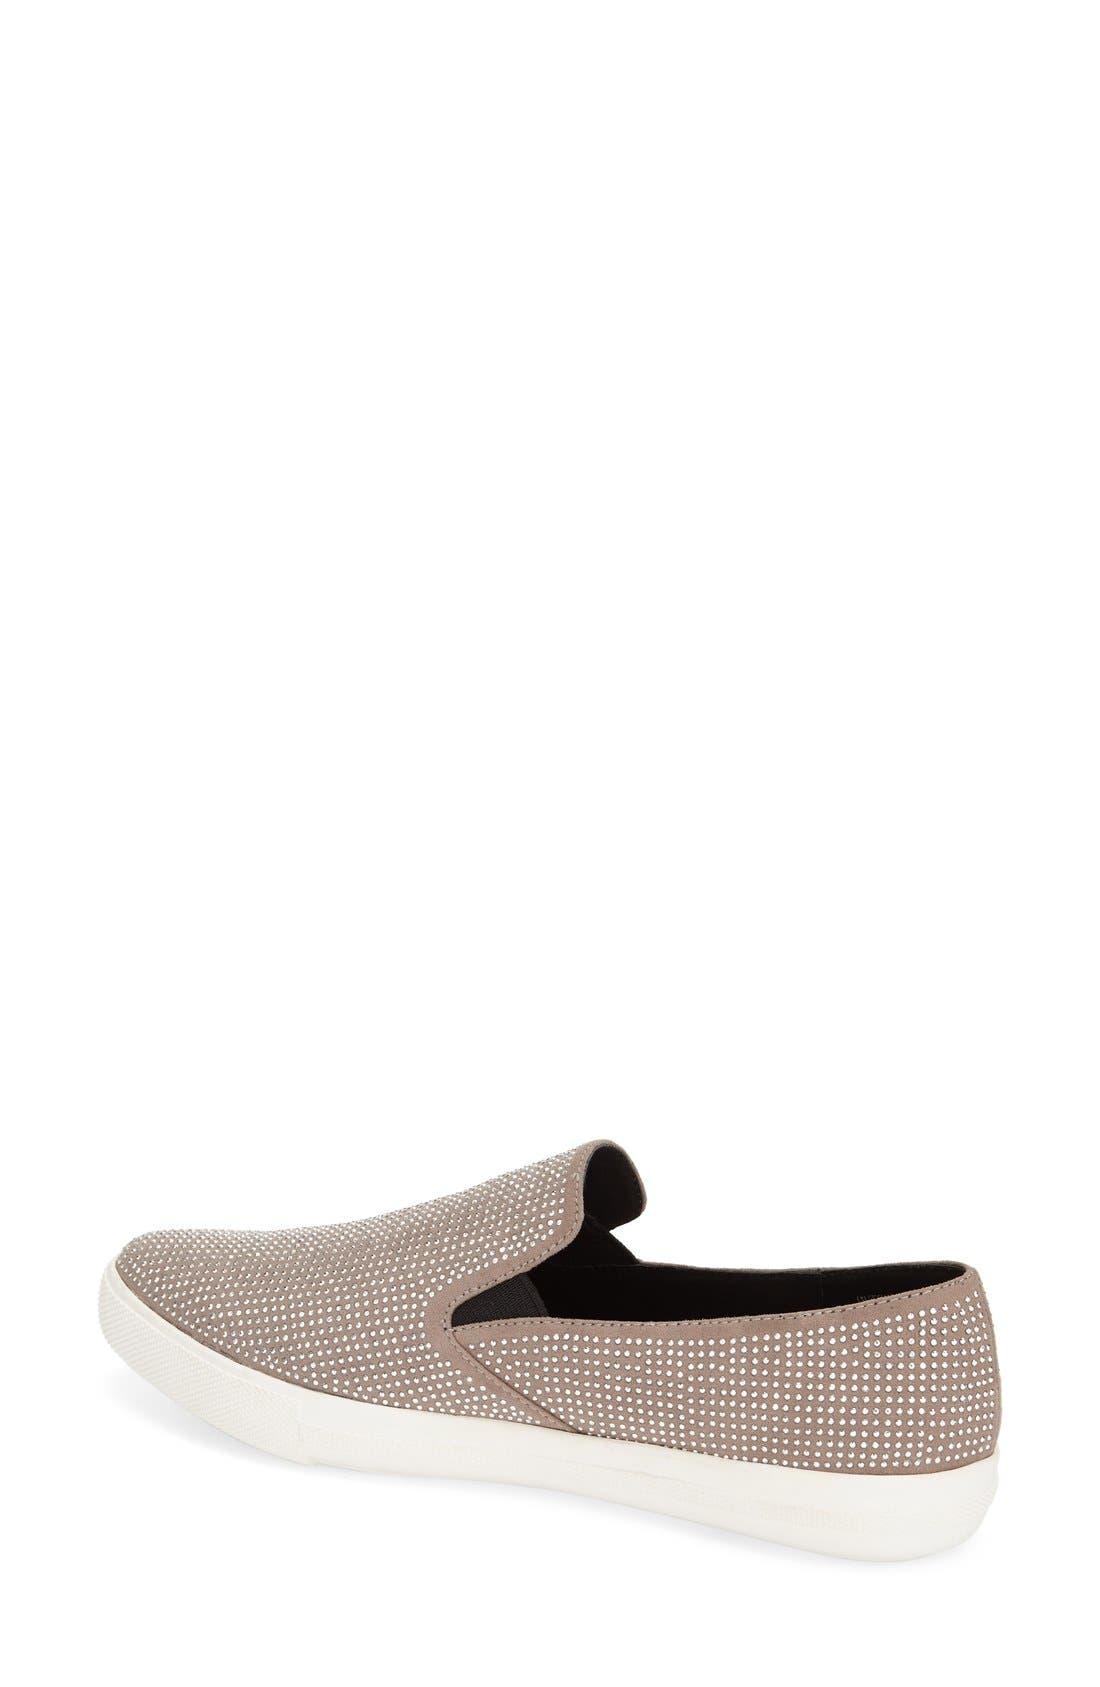 Alternate Image 2  - Kristin Cavallari 'Outcome' Embellished Slip-On Sneaker (Women)